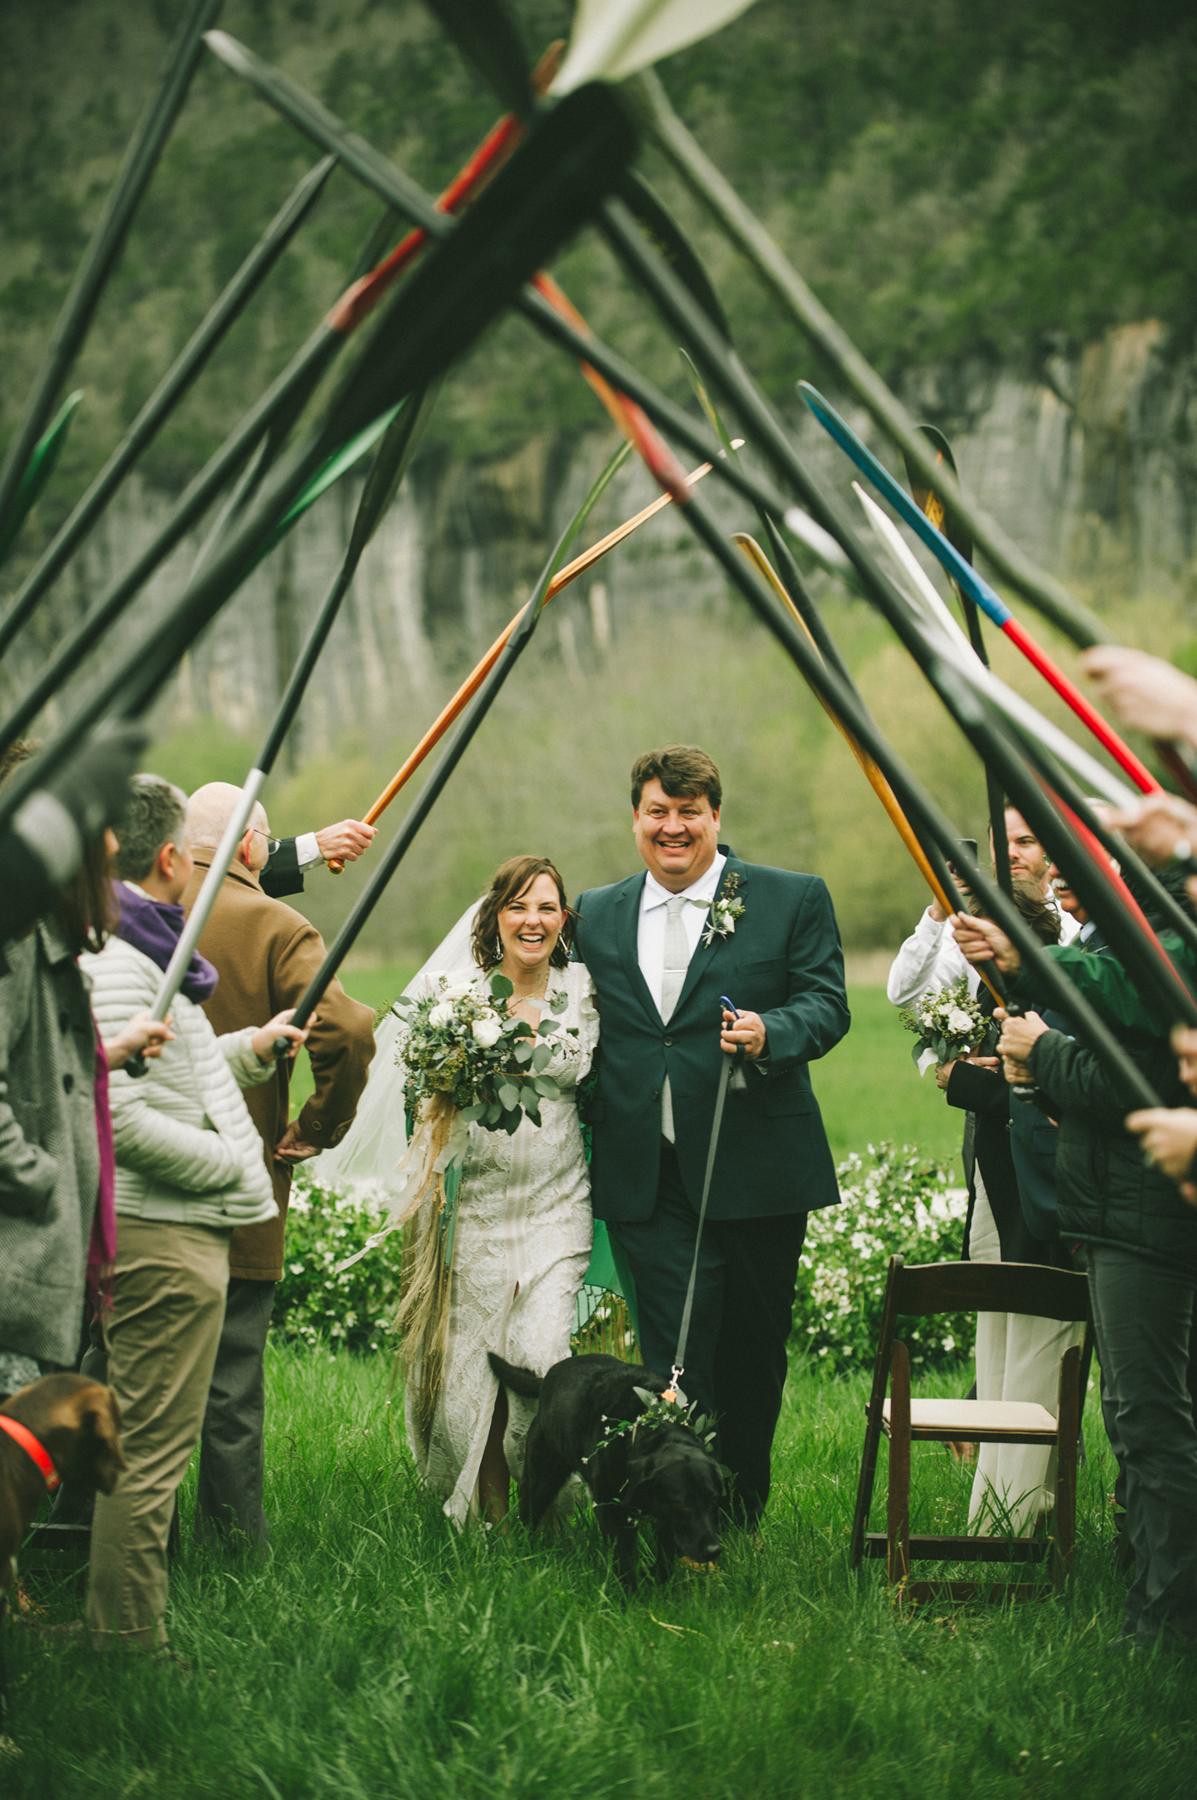 Davis-Handley-Wedding-2-4712.jpg